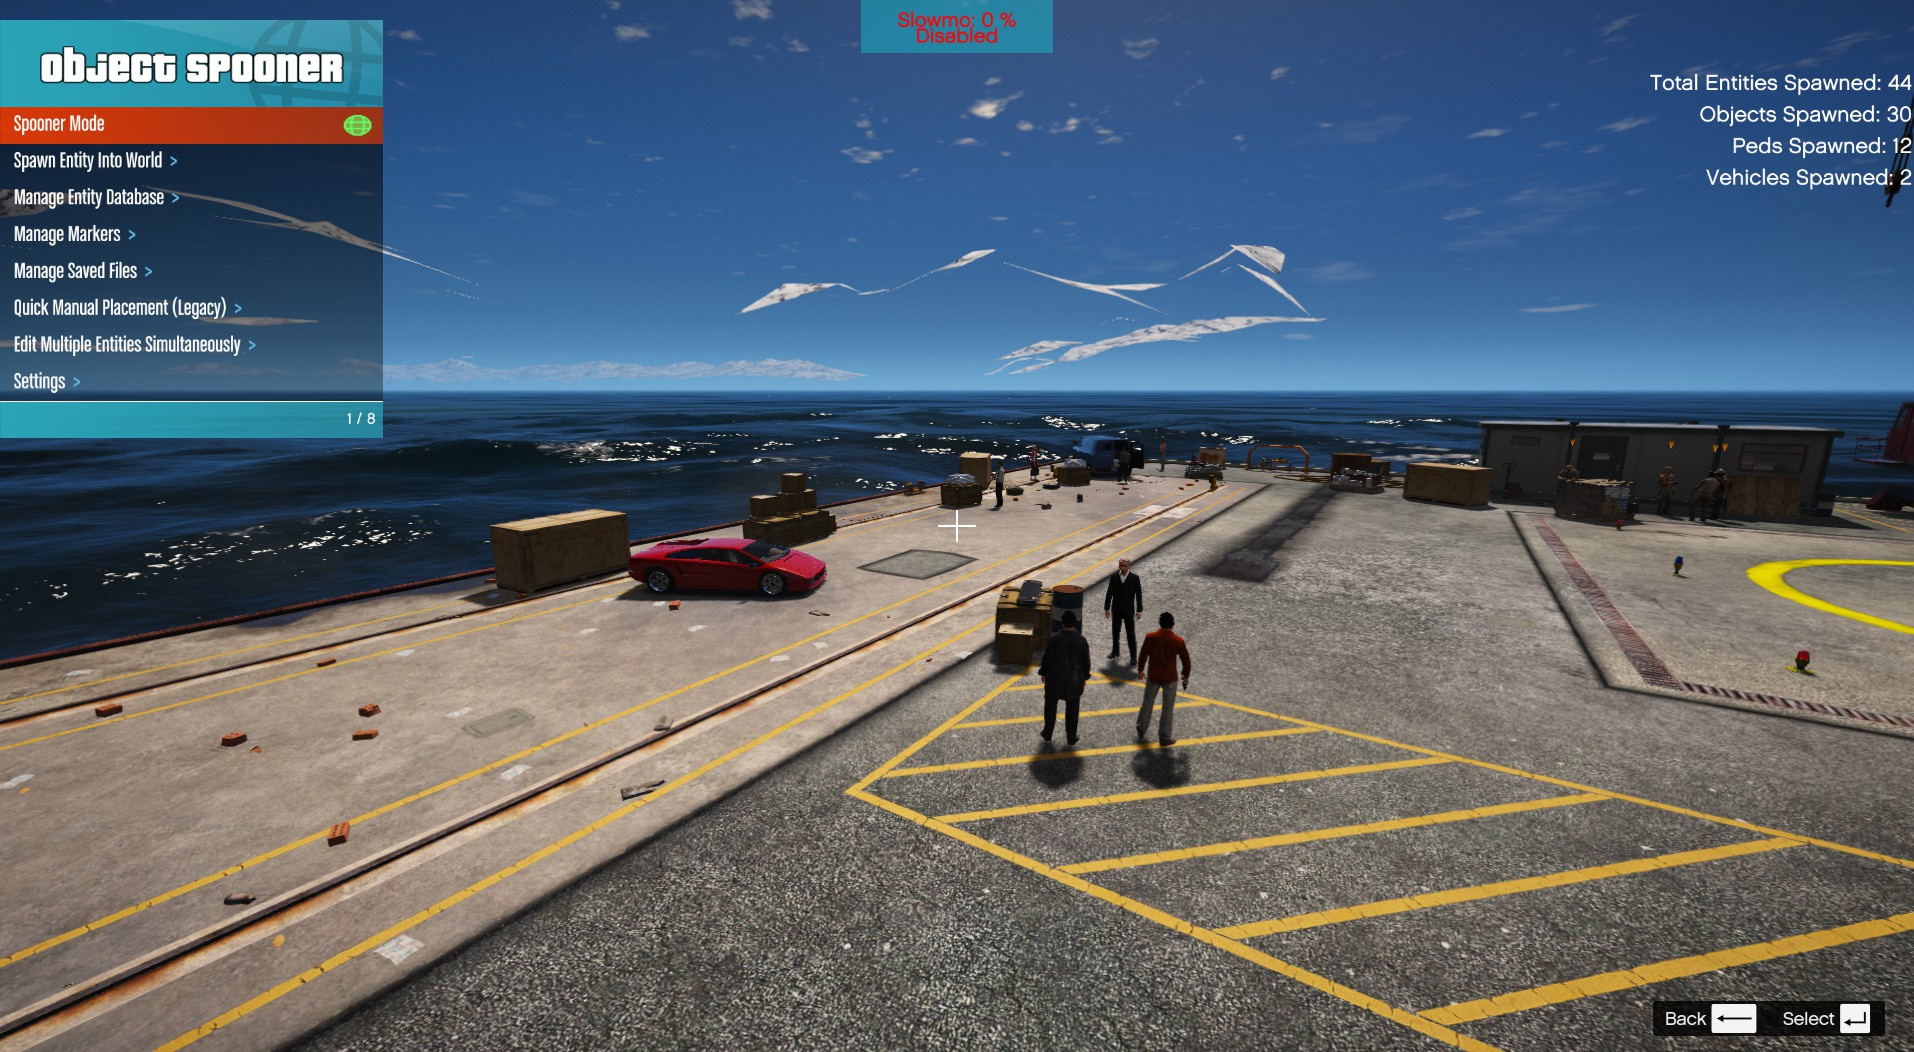 reverse flash saves Damien Darhk (menyoo) - GTA5-Mods com